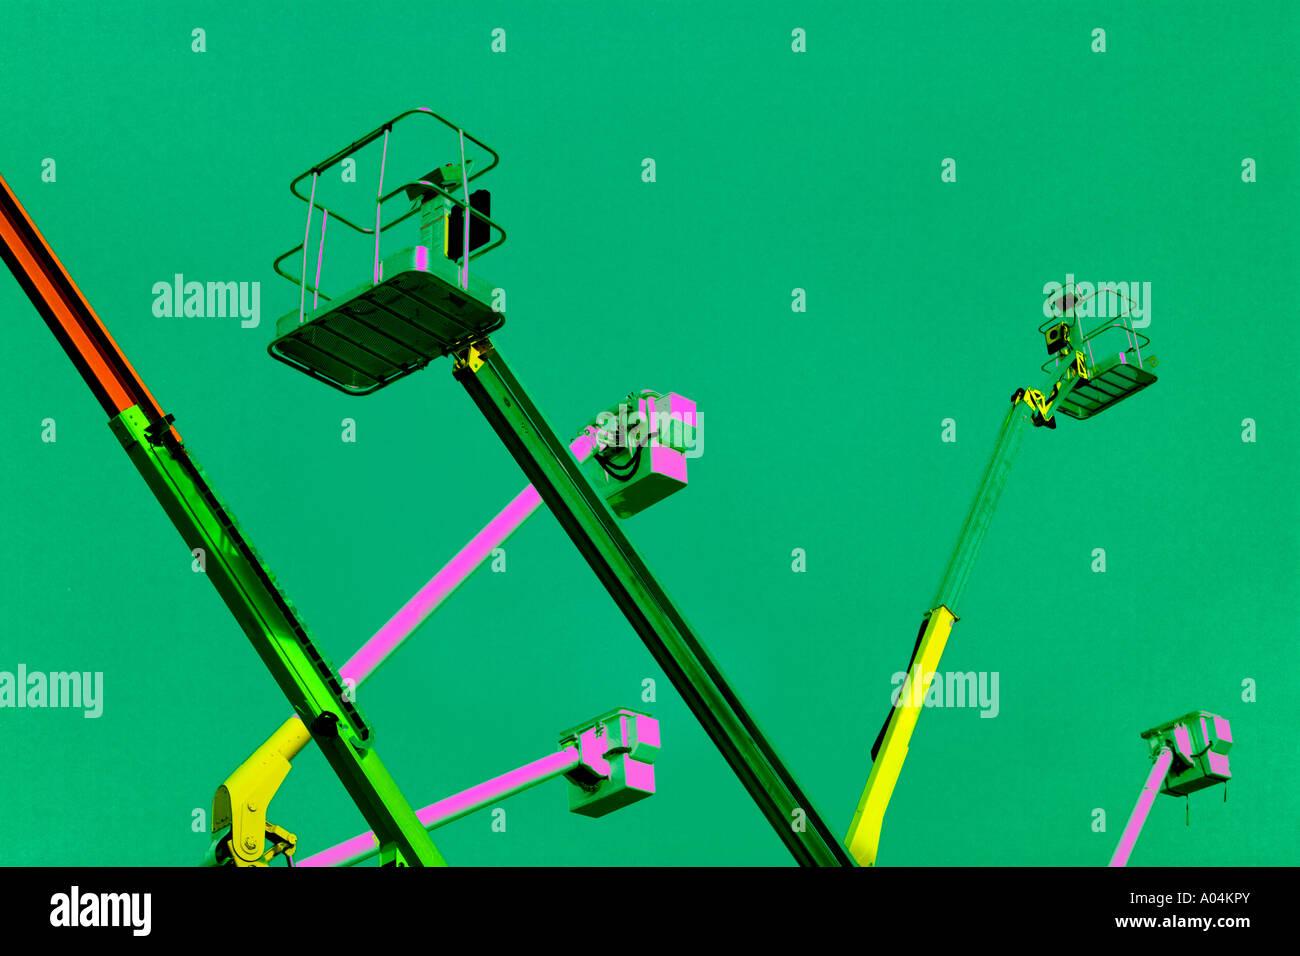 Telescoping platforms - Stock Image